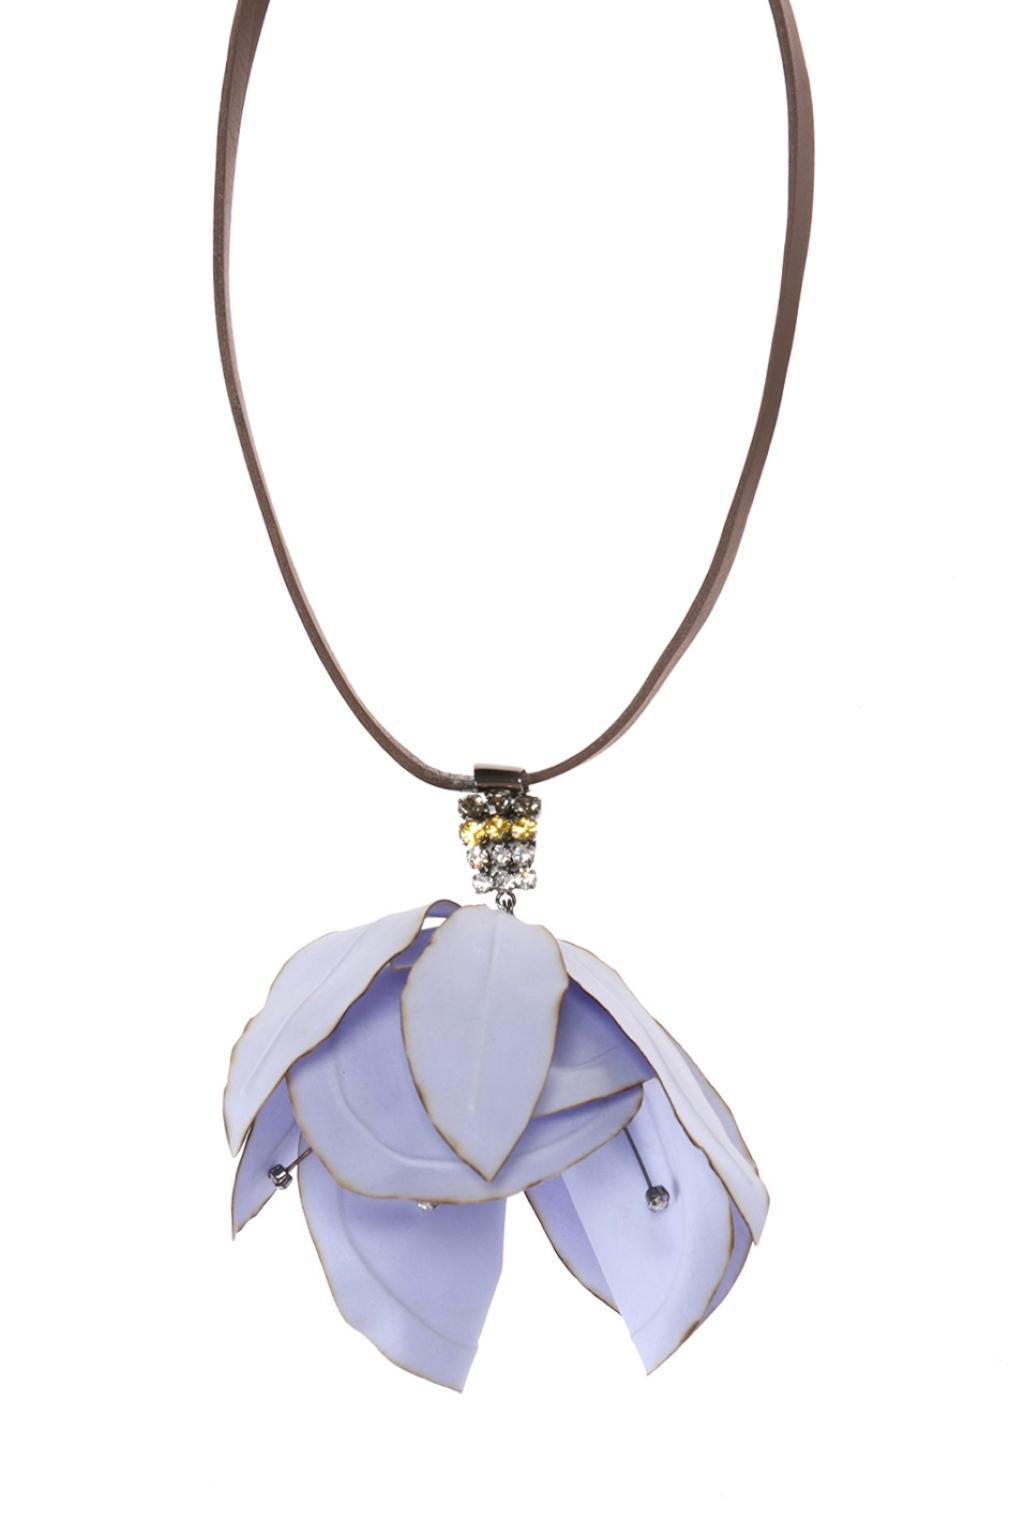 Marni flower pendant necklace - Brown KM6qvo